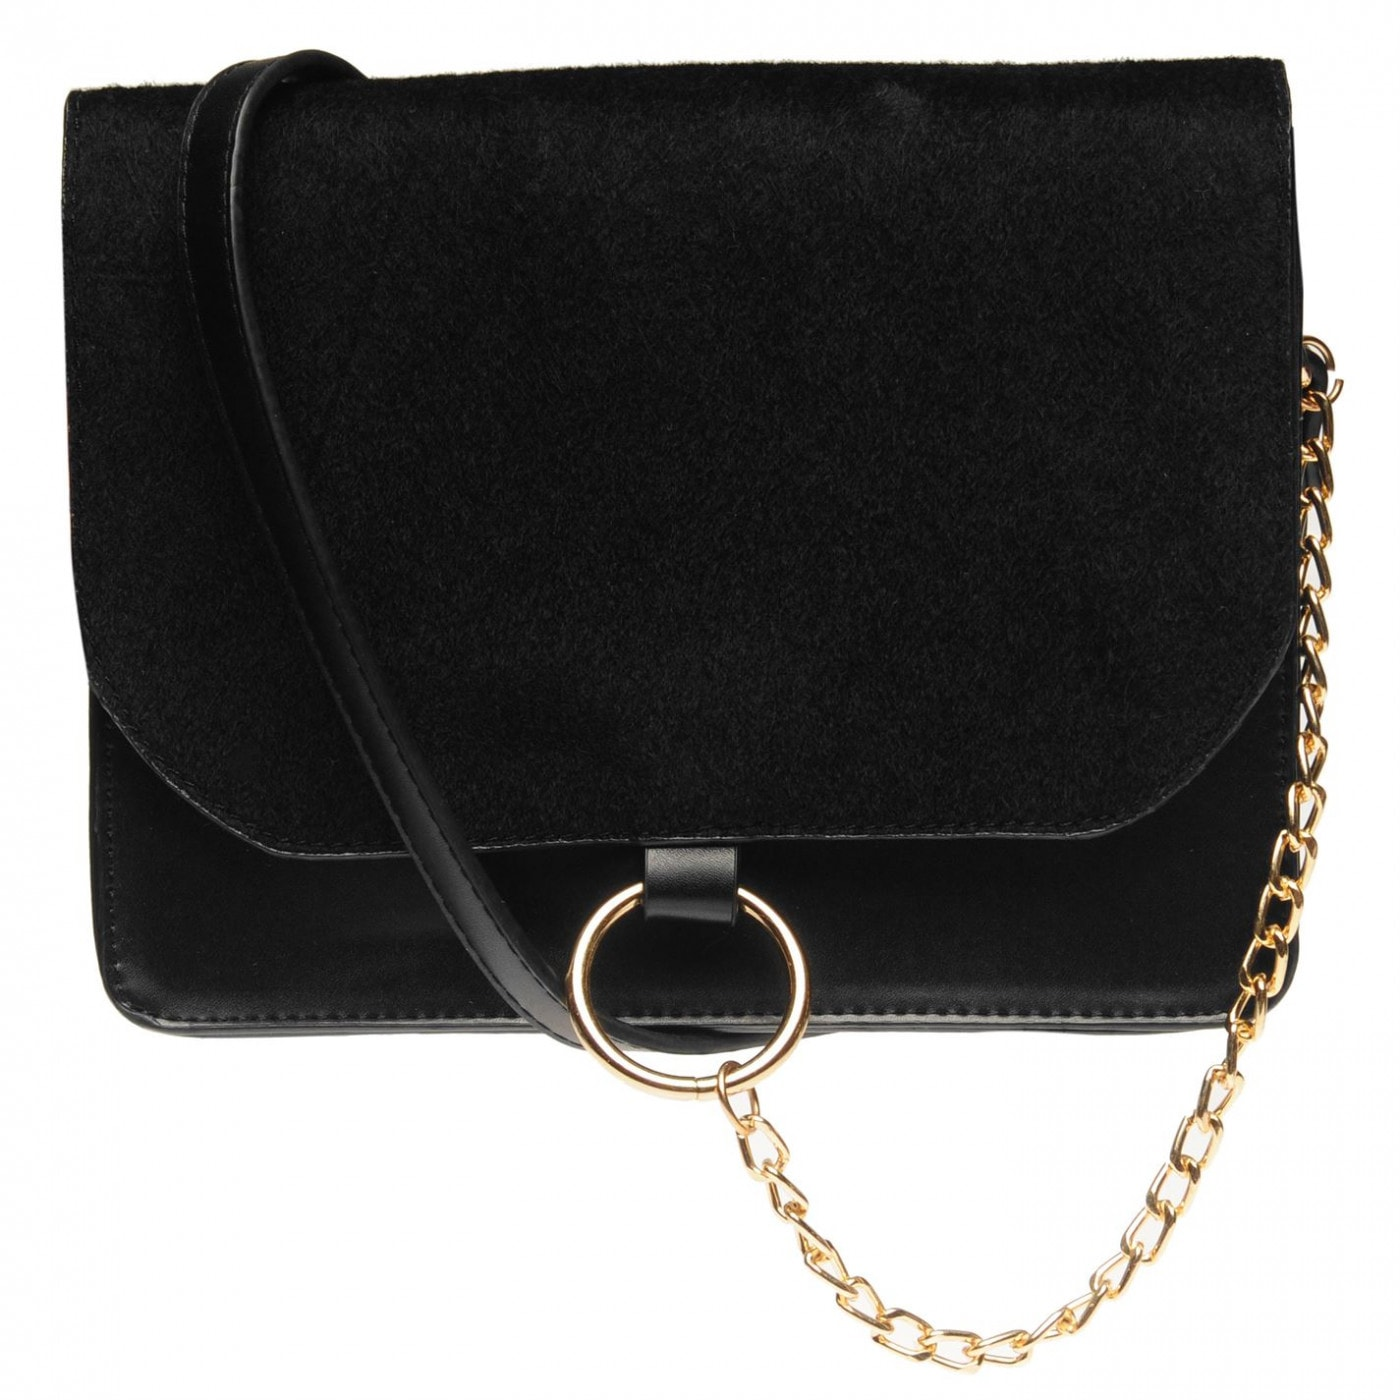 USC PU Chain Bag